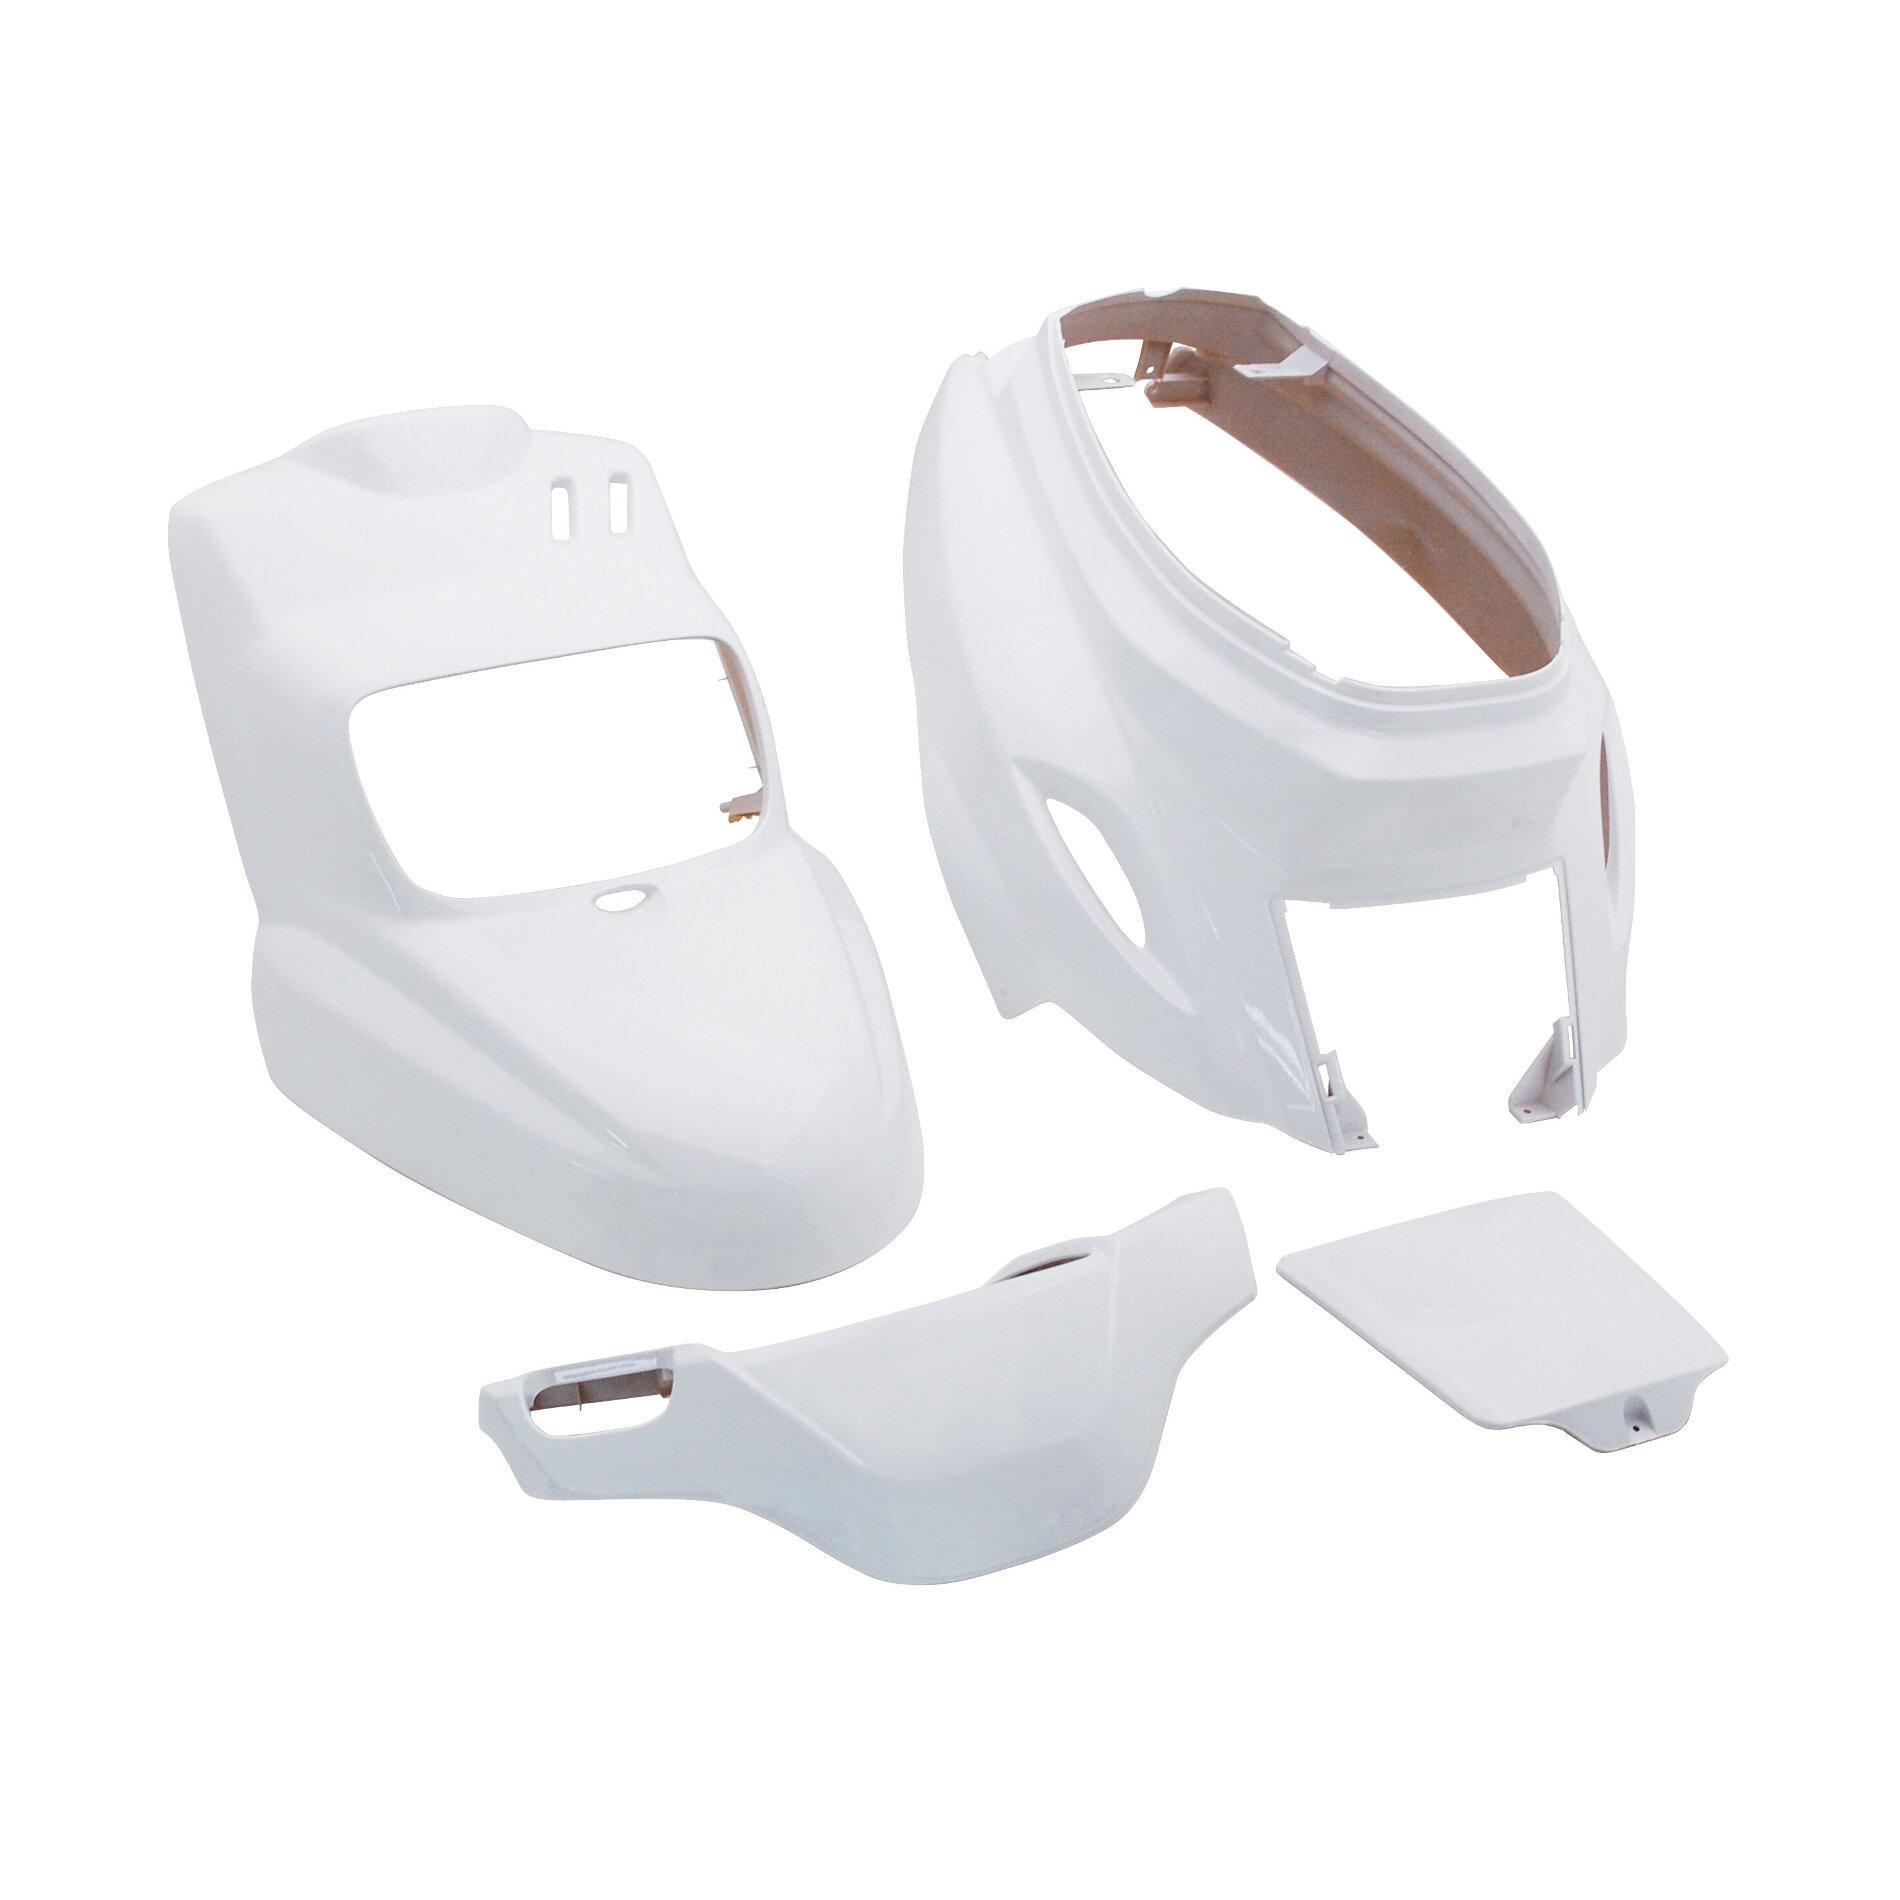 Kit carénage MBK Booster / Yamaha BW'S 2004- (4 Pièces) - Blanc